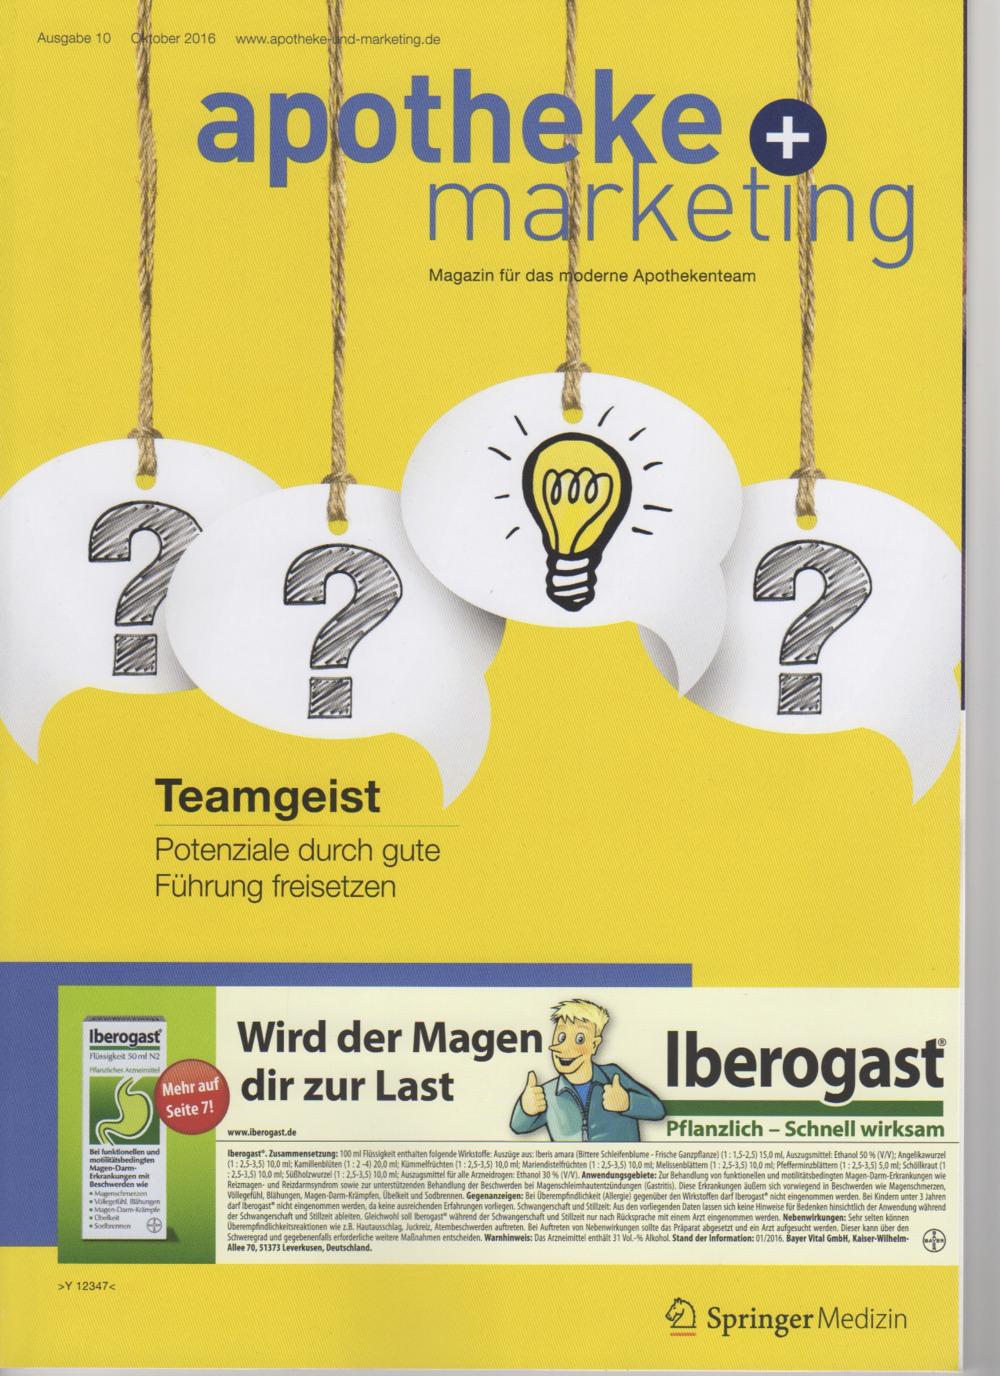 Apotheke_und_Marketing_1.png